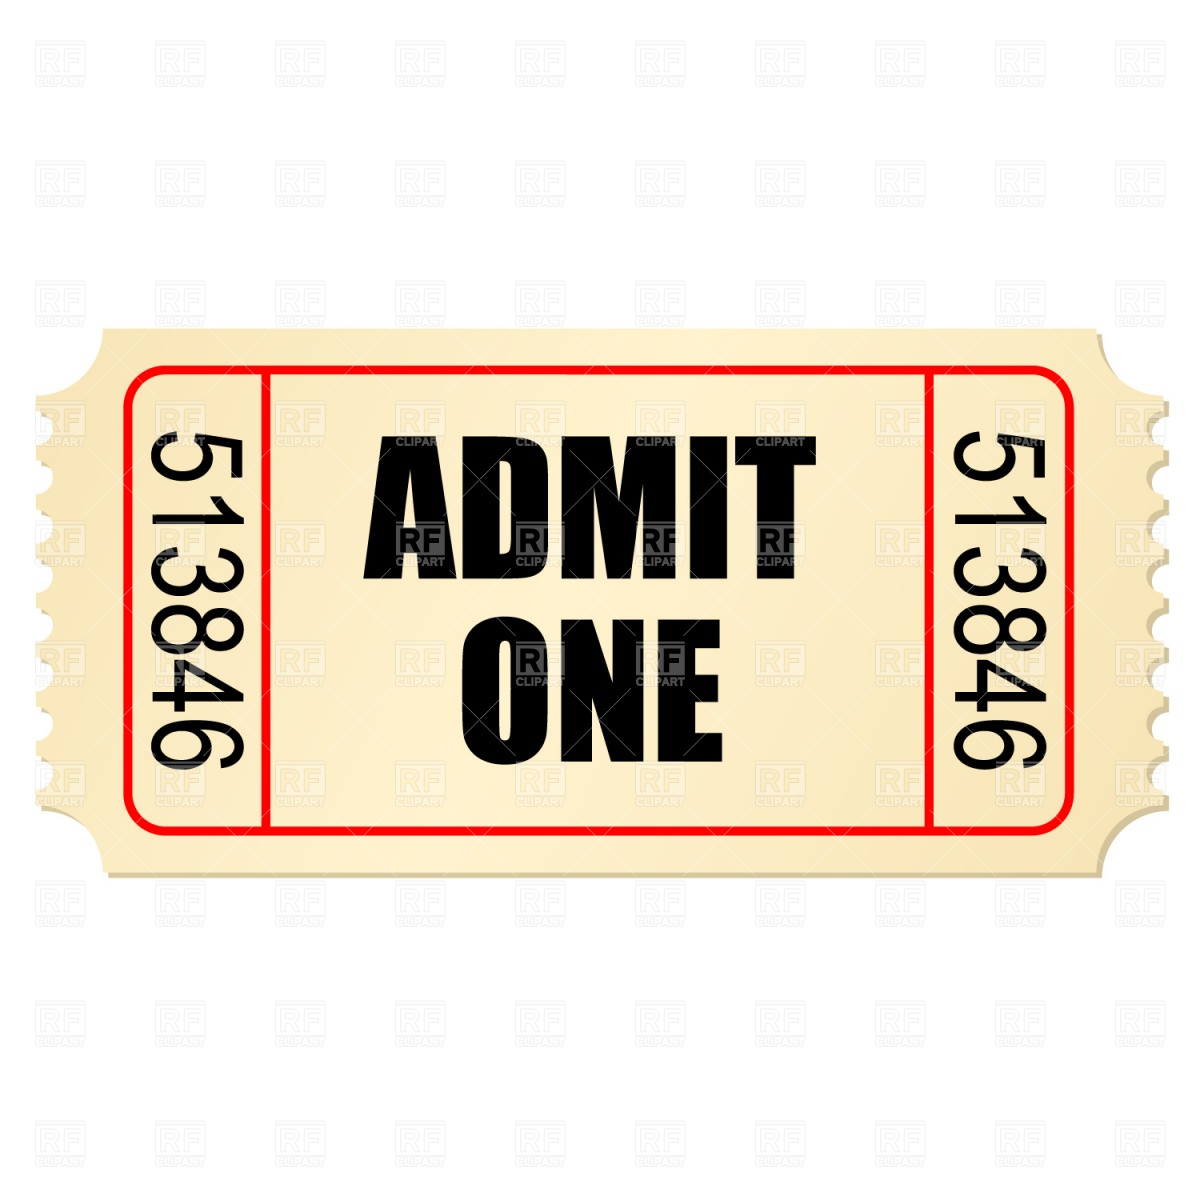 Blank ticket stub clipart.